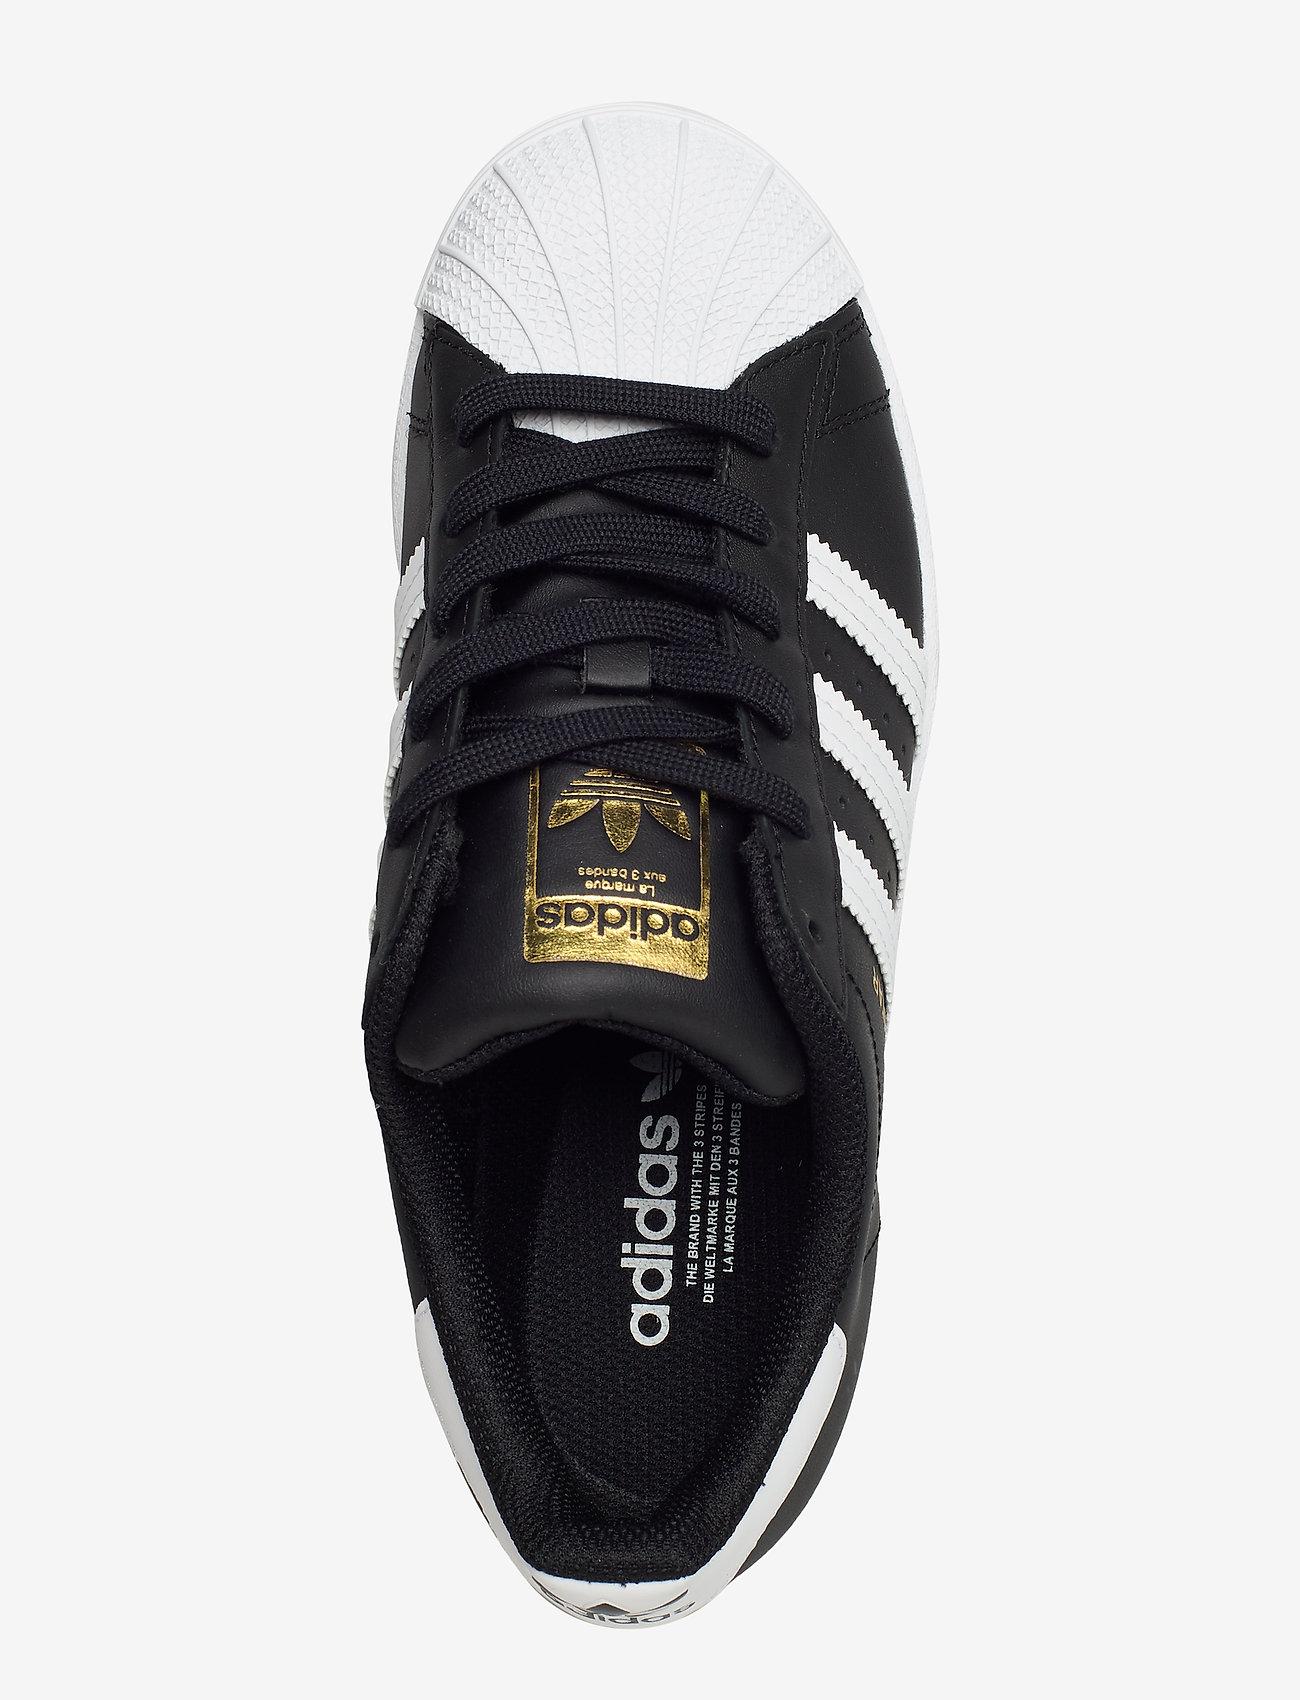 adidas Originals - Superstar  W - low top sneakers - cblack/ftwwht/cblack - 3